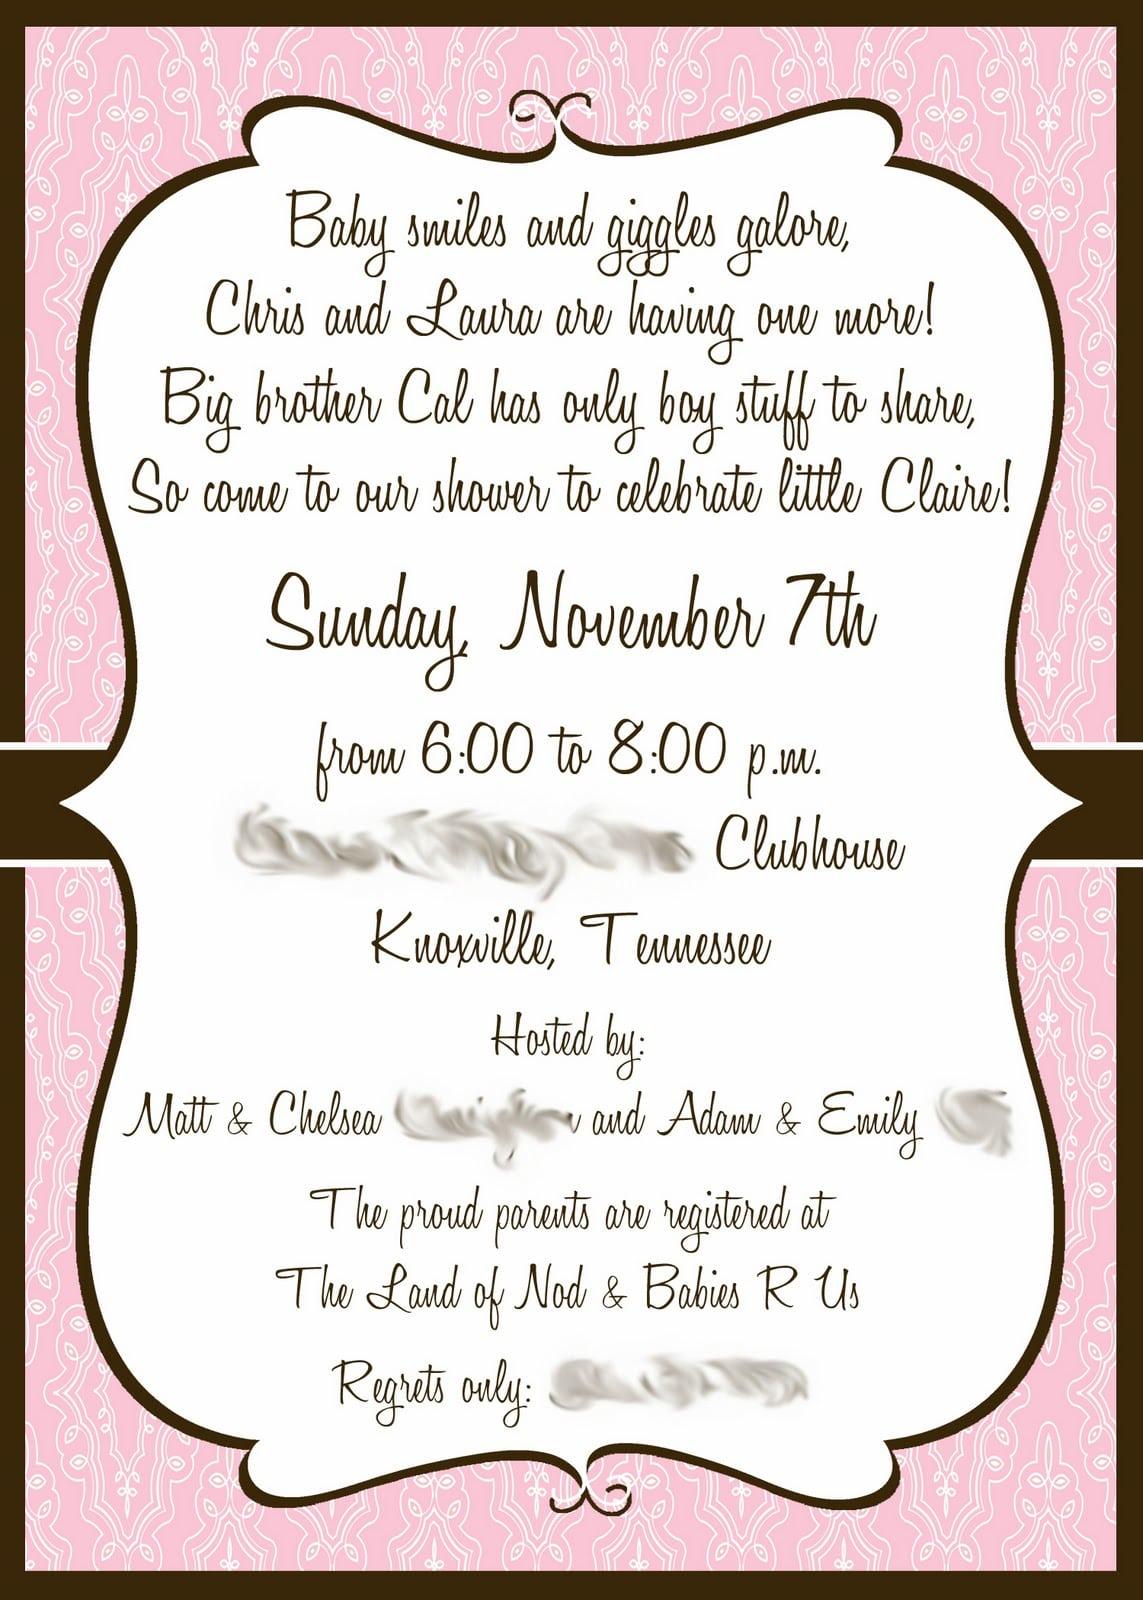 Wedding Invitations Wording Spanish  Baby Shower Invitations In